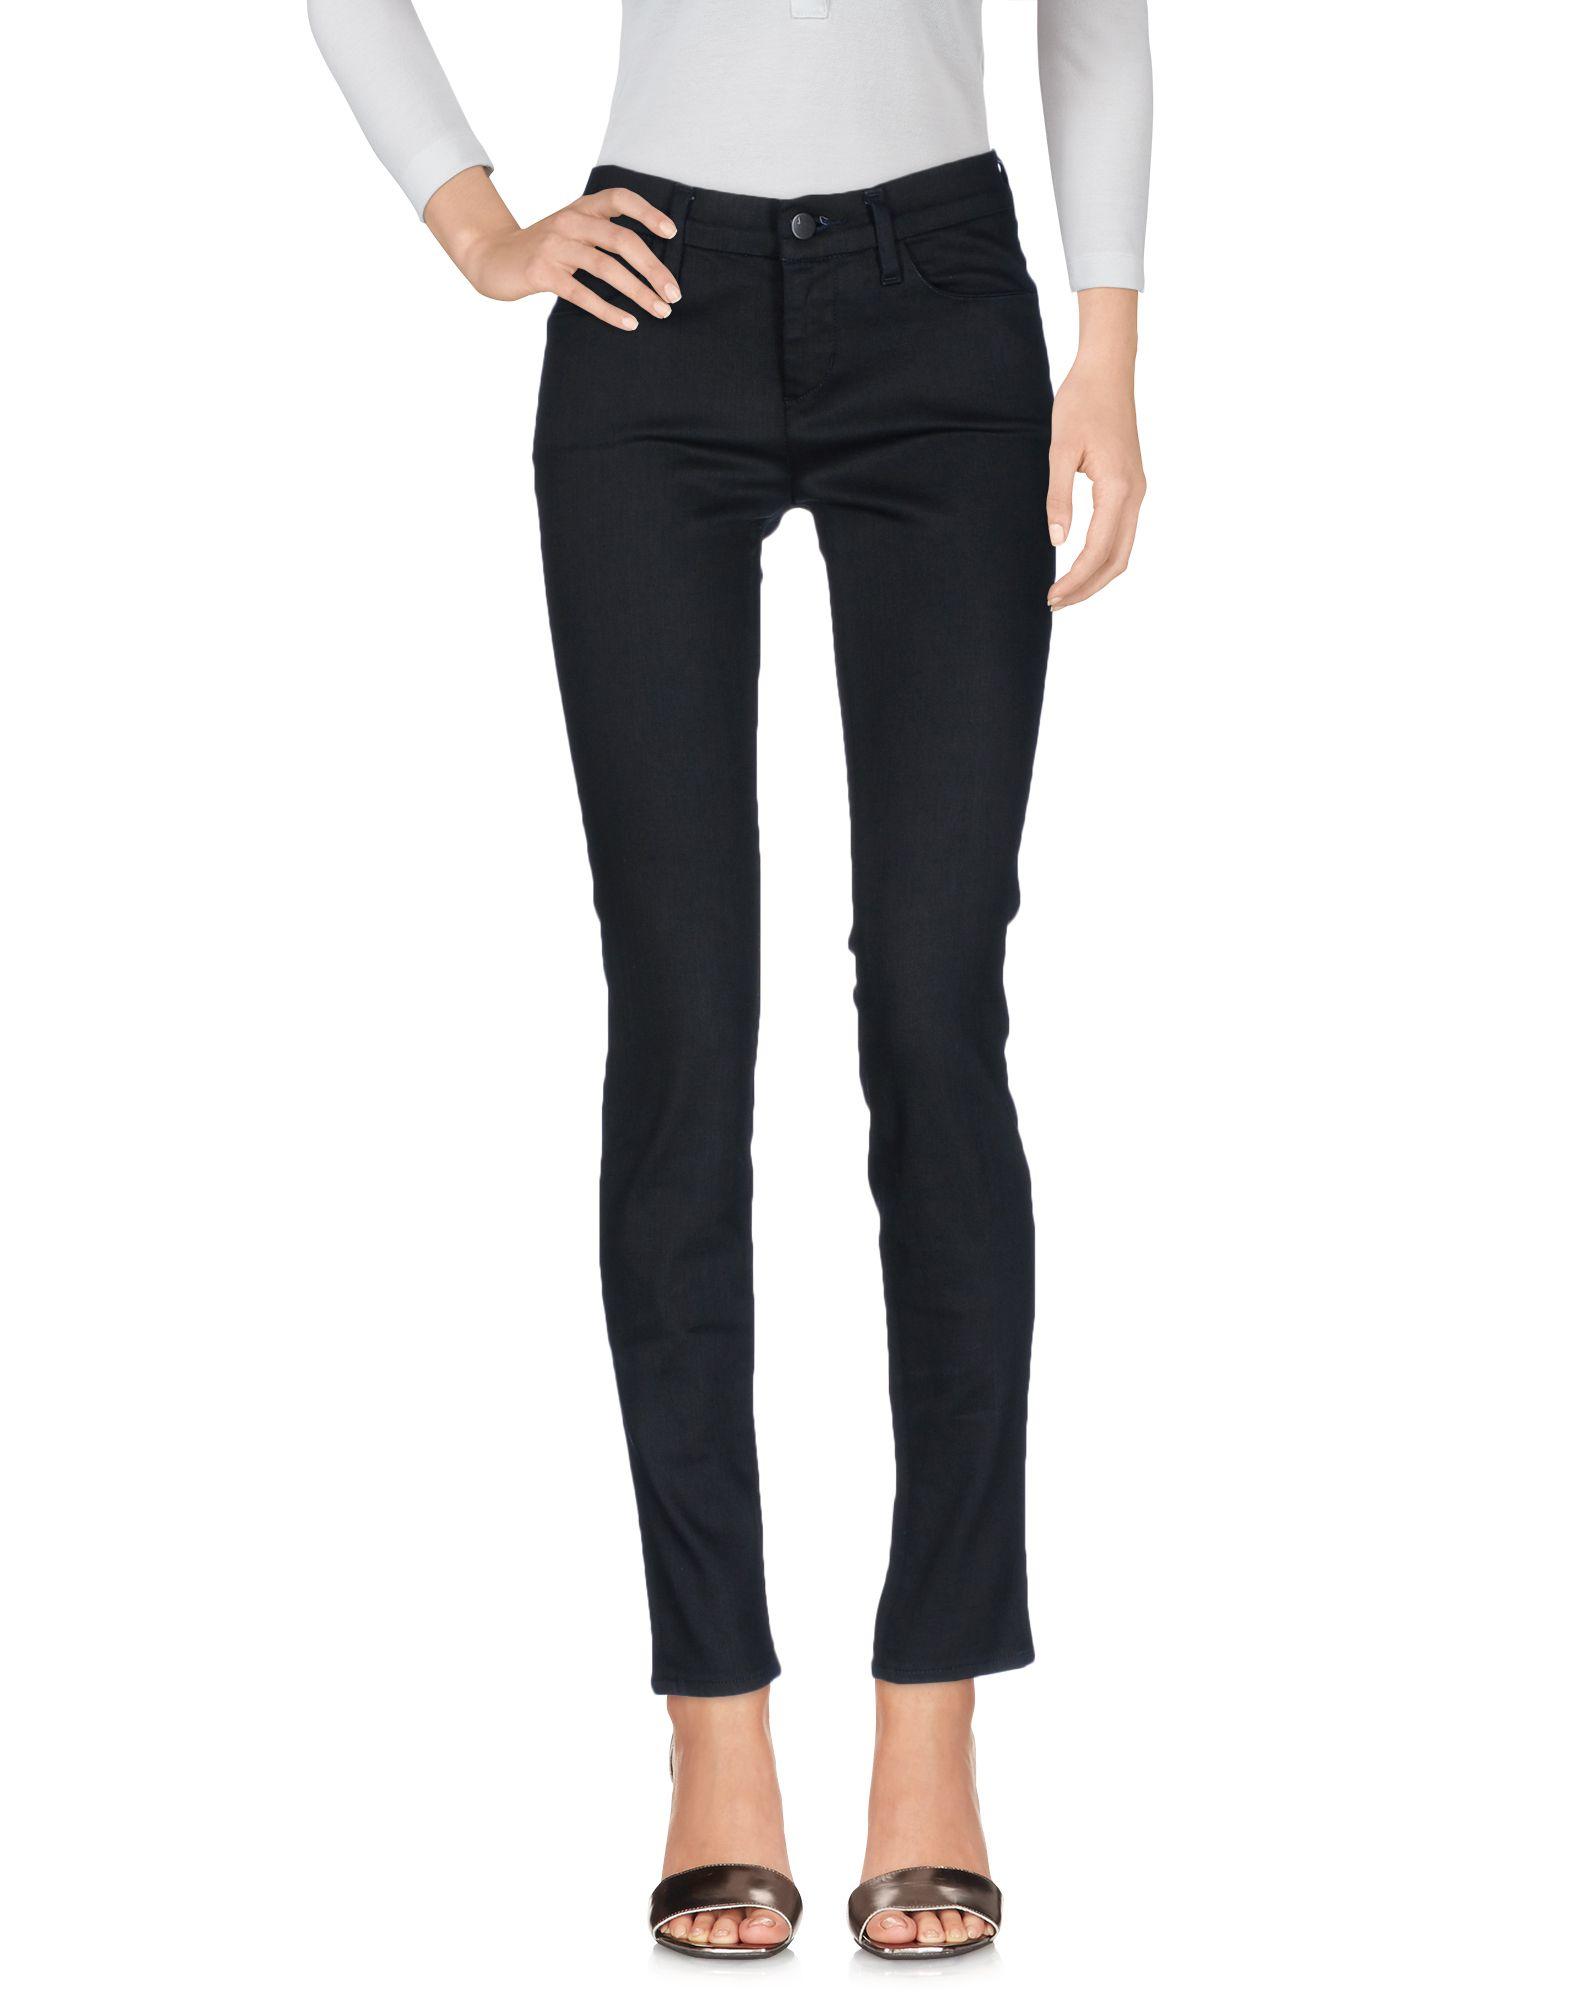 Pantaloni Jeans J Brand Donna - Acquista online su 5PoUIcM